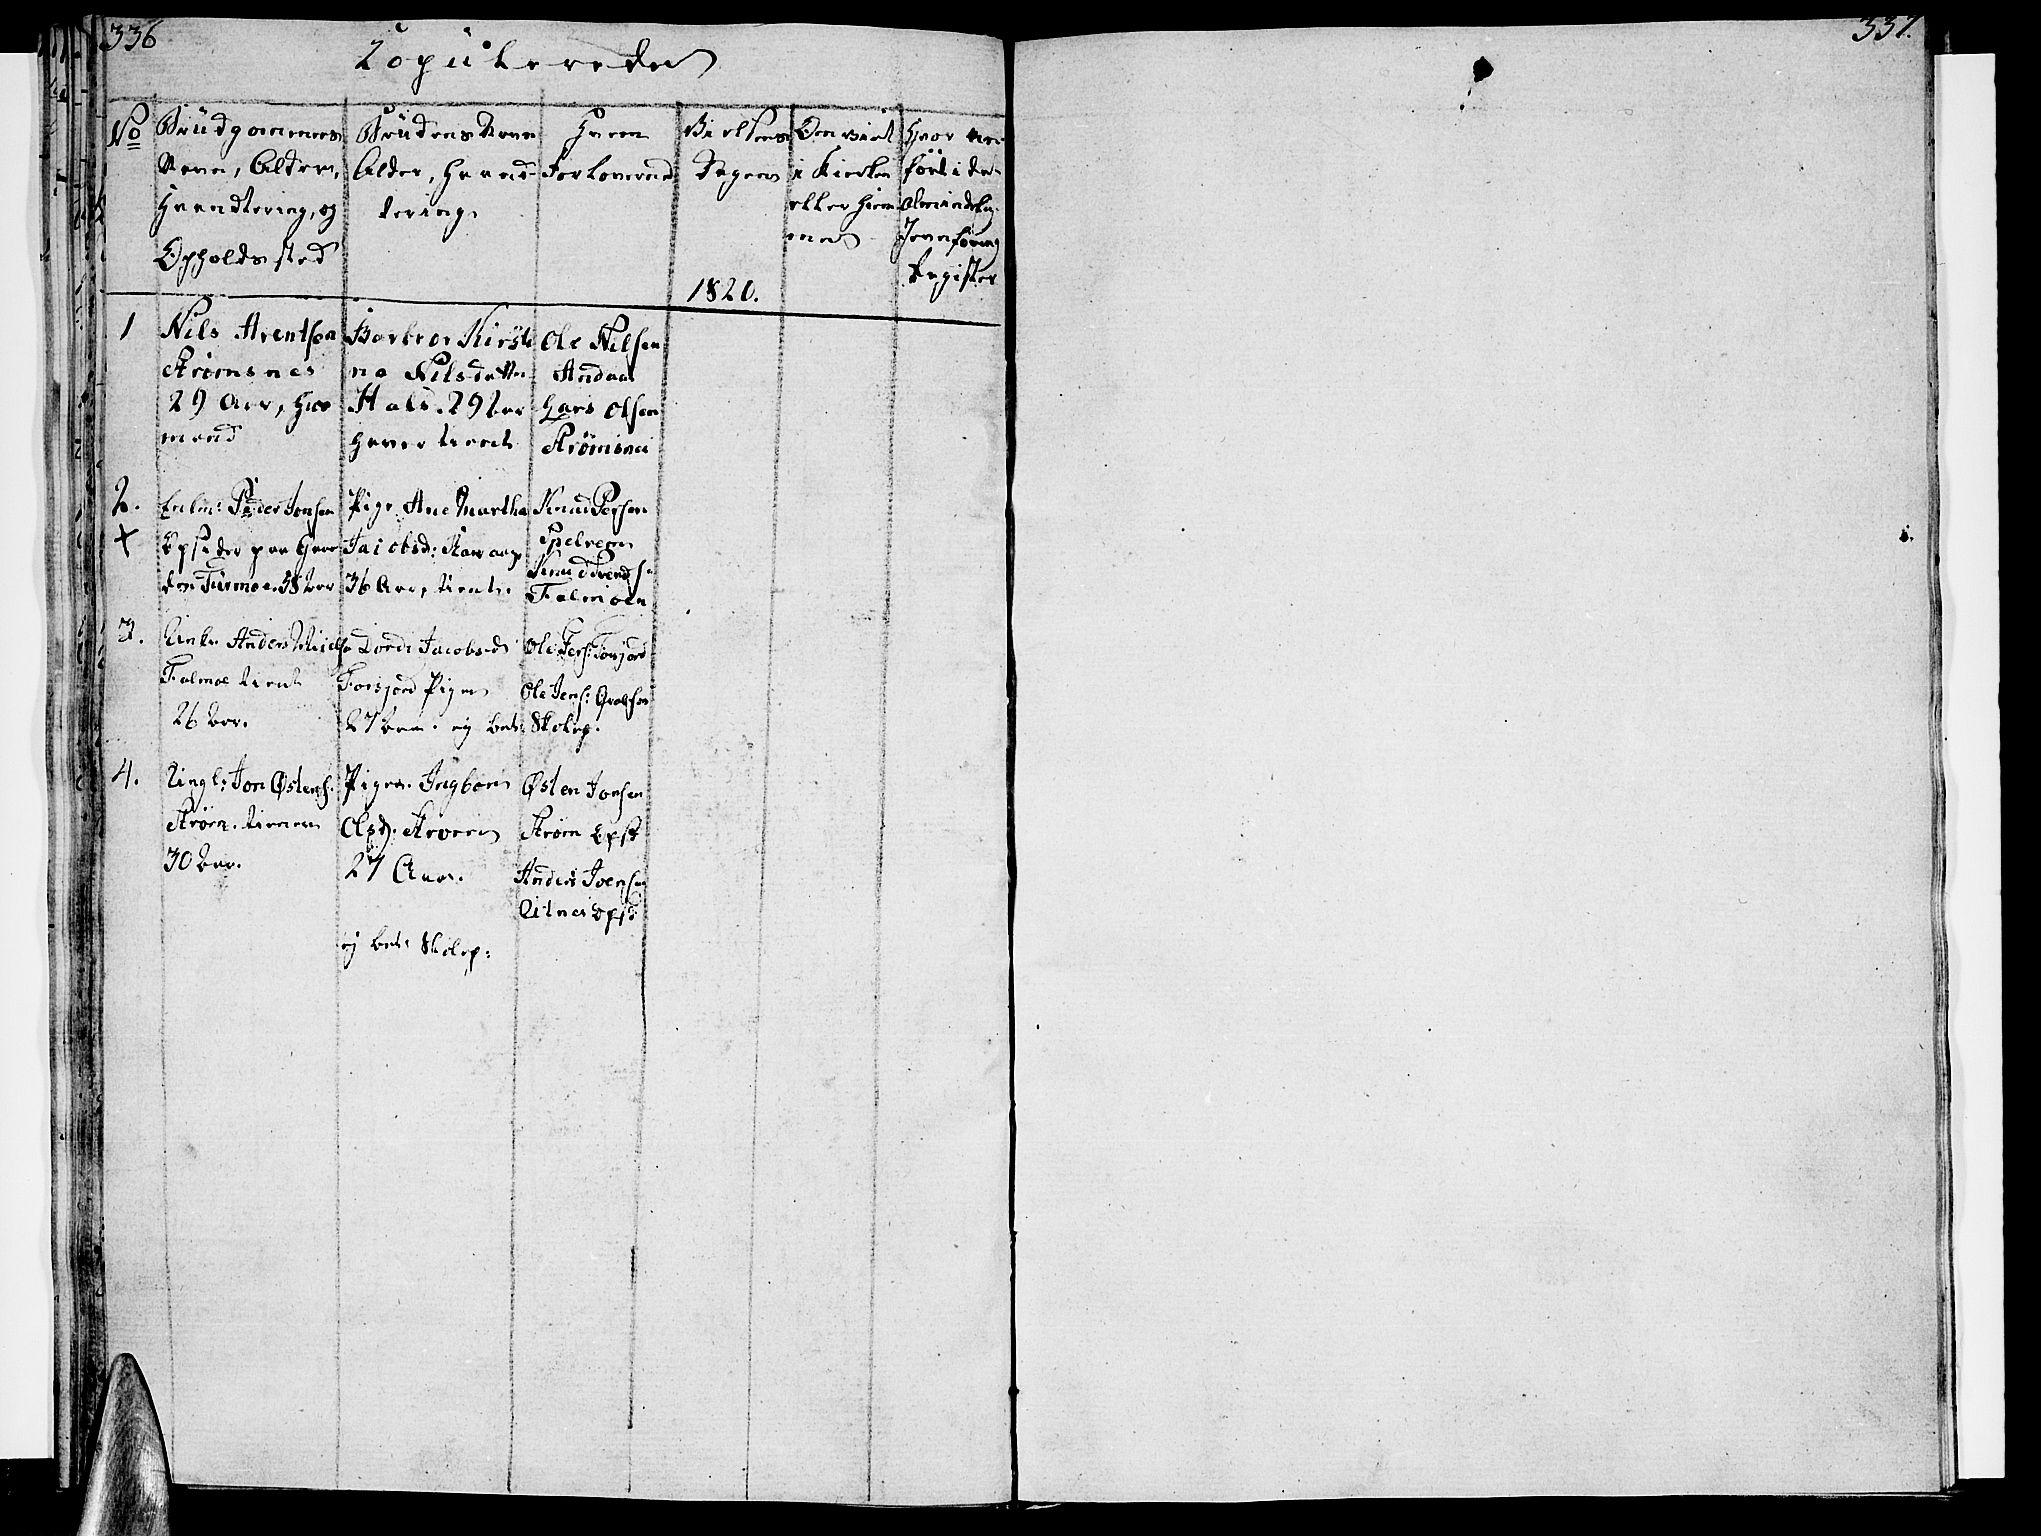 SAT, Ministerialprotokoller, klokkerbøker og fødselsregistre - Nordland, 820/L0287: Ministerialbok nr. 820A08, 1800-1819, s. 336-337